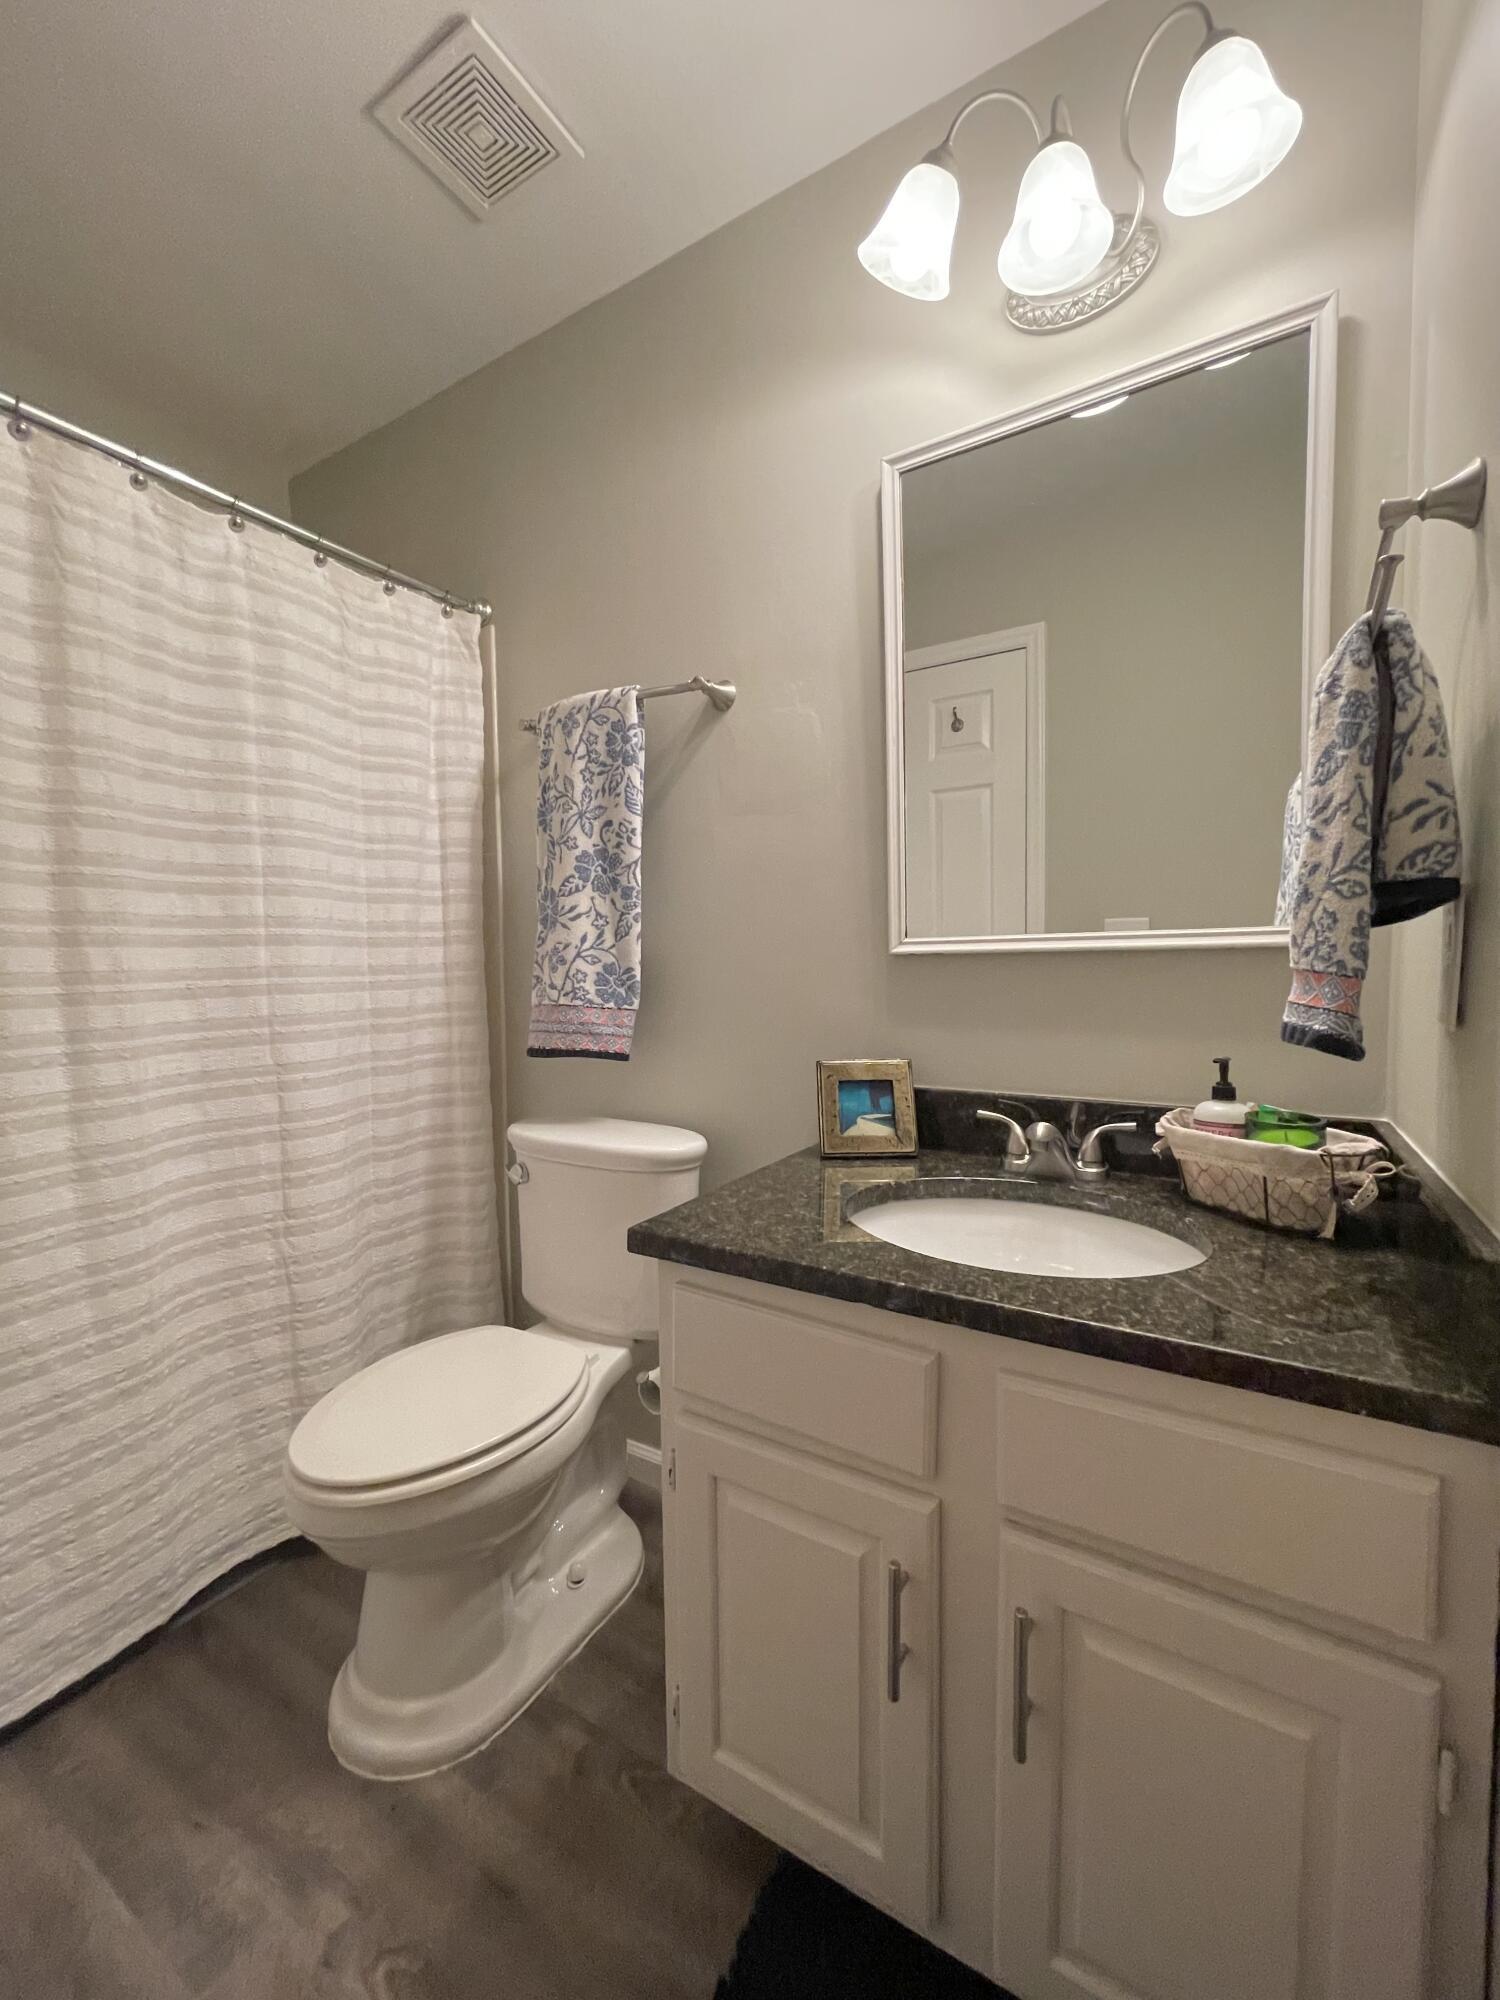 Quail Hollow Homes For Sale - 1364 Downsberry, Mount Pleasant, SC - 6